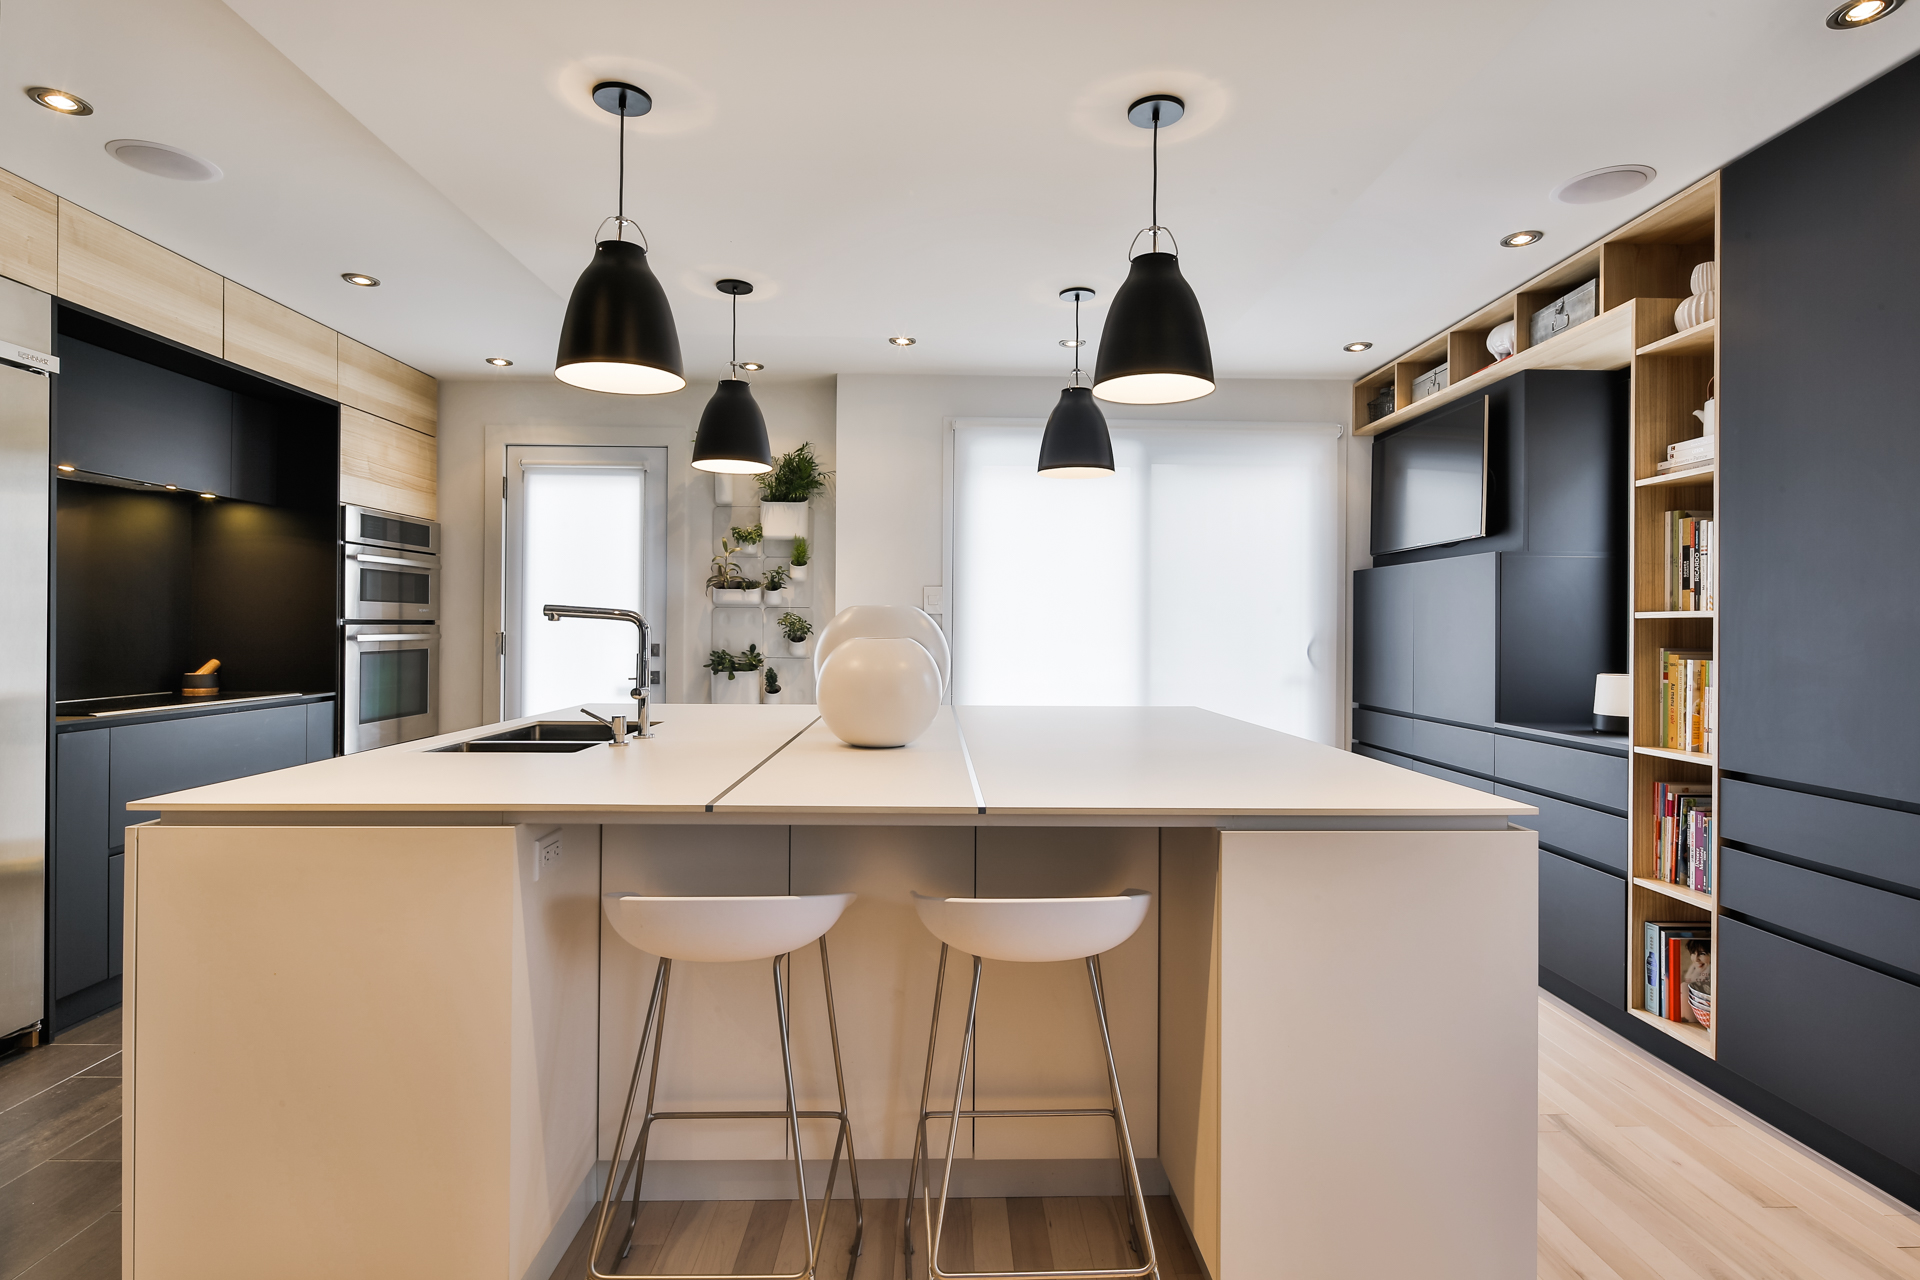 Подсветка кухонного гарнитура модерн